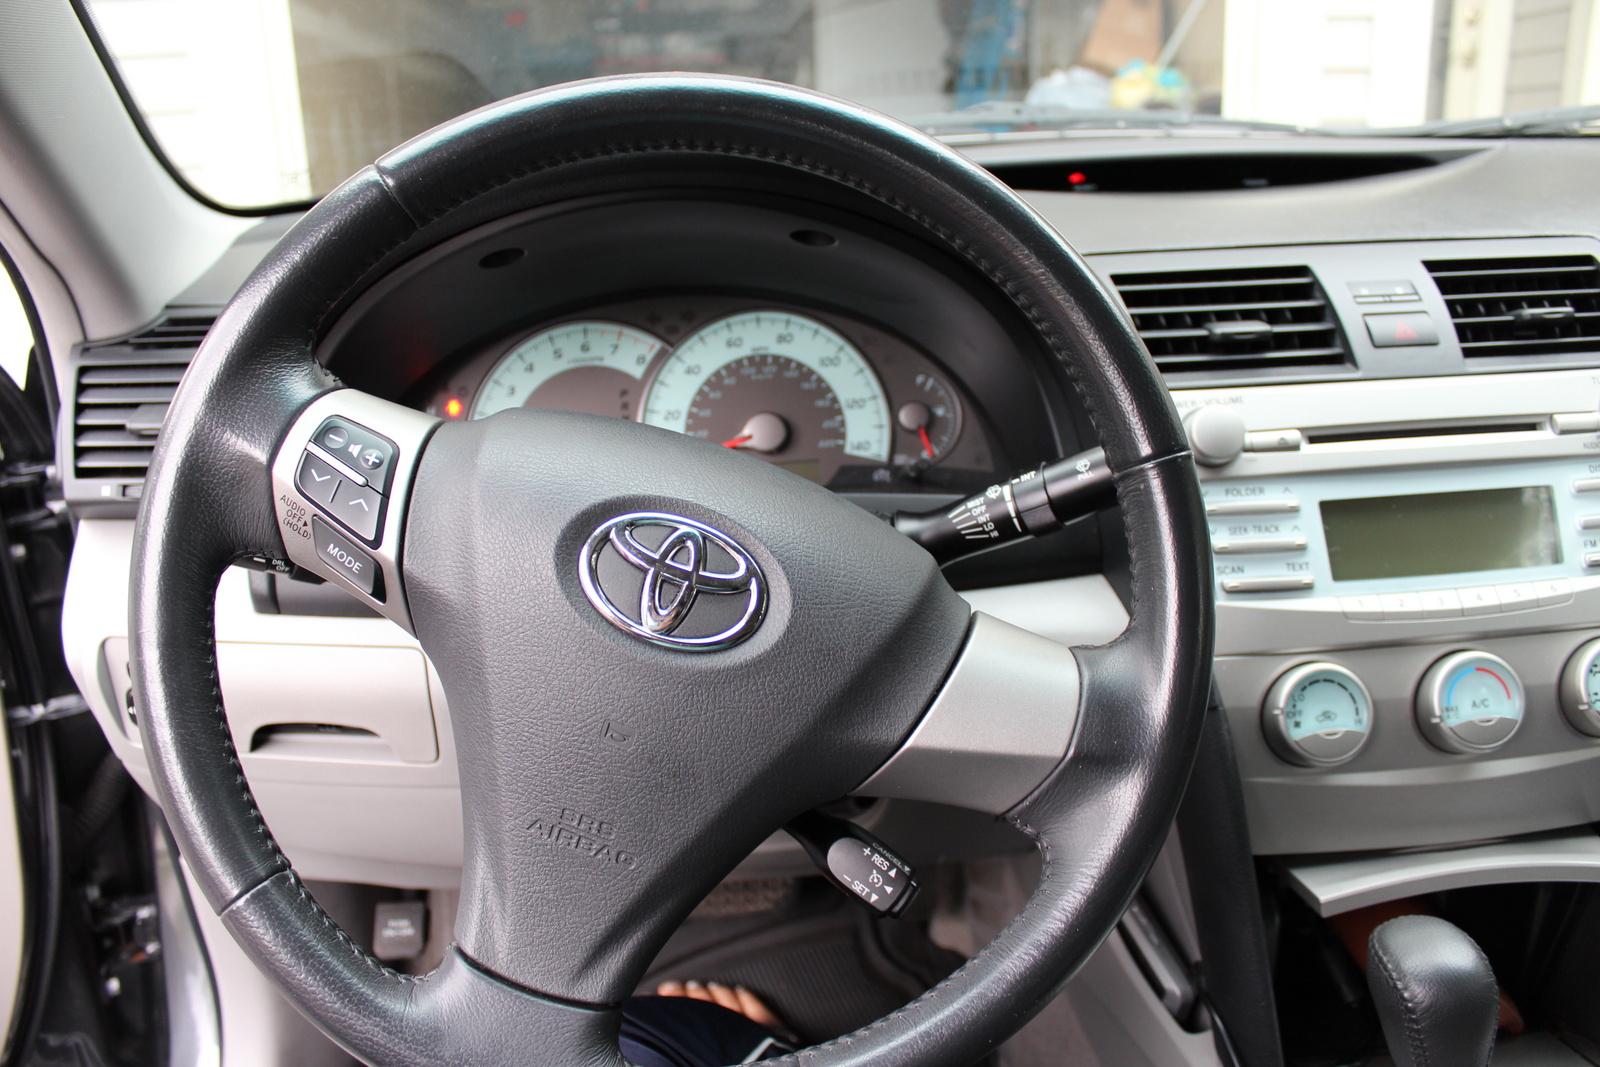 2009 Toyota Camry Pictures Cargurus